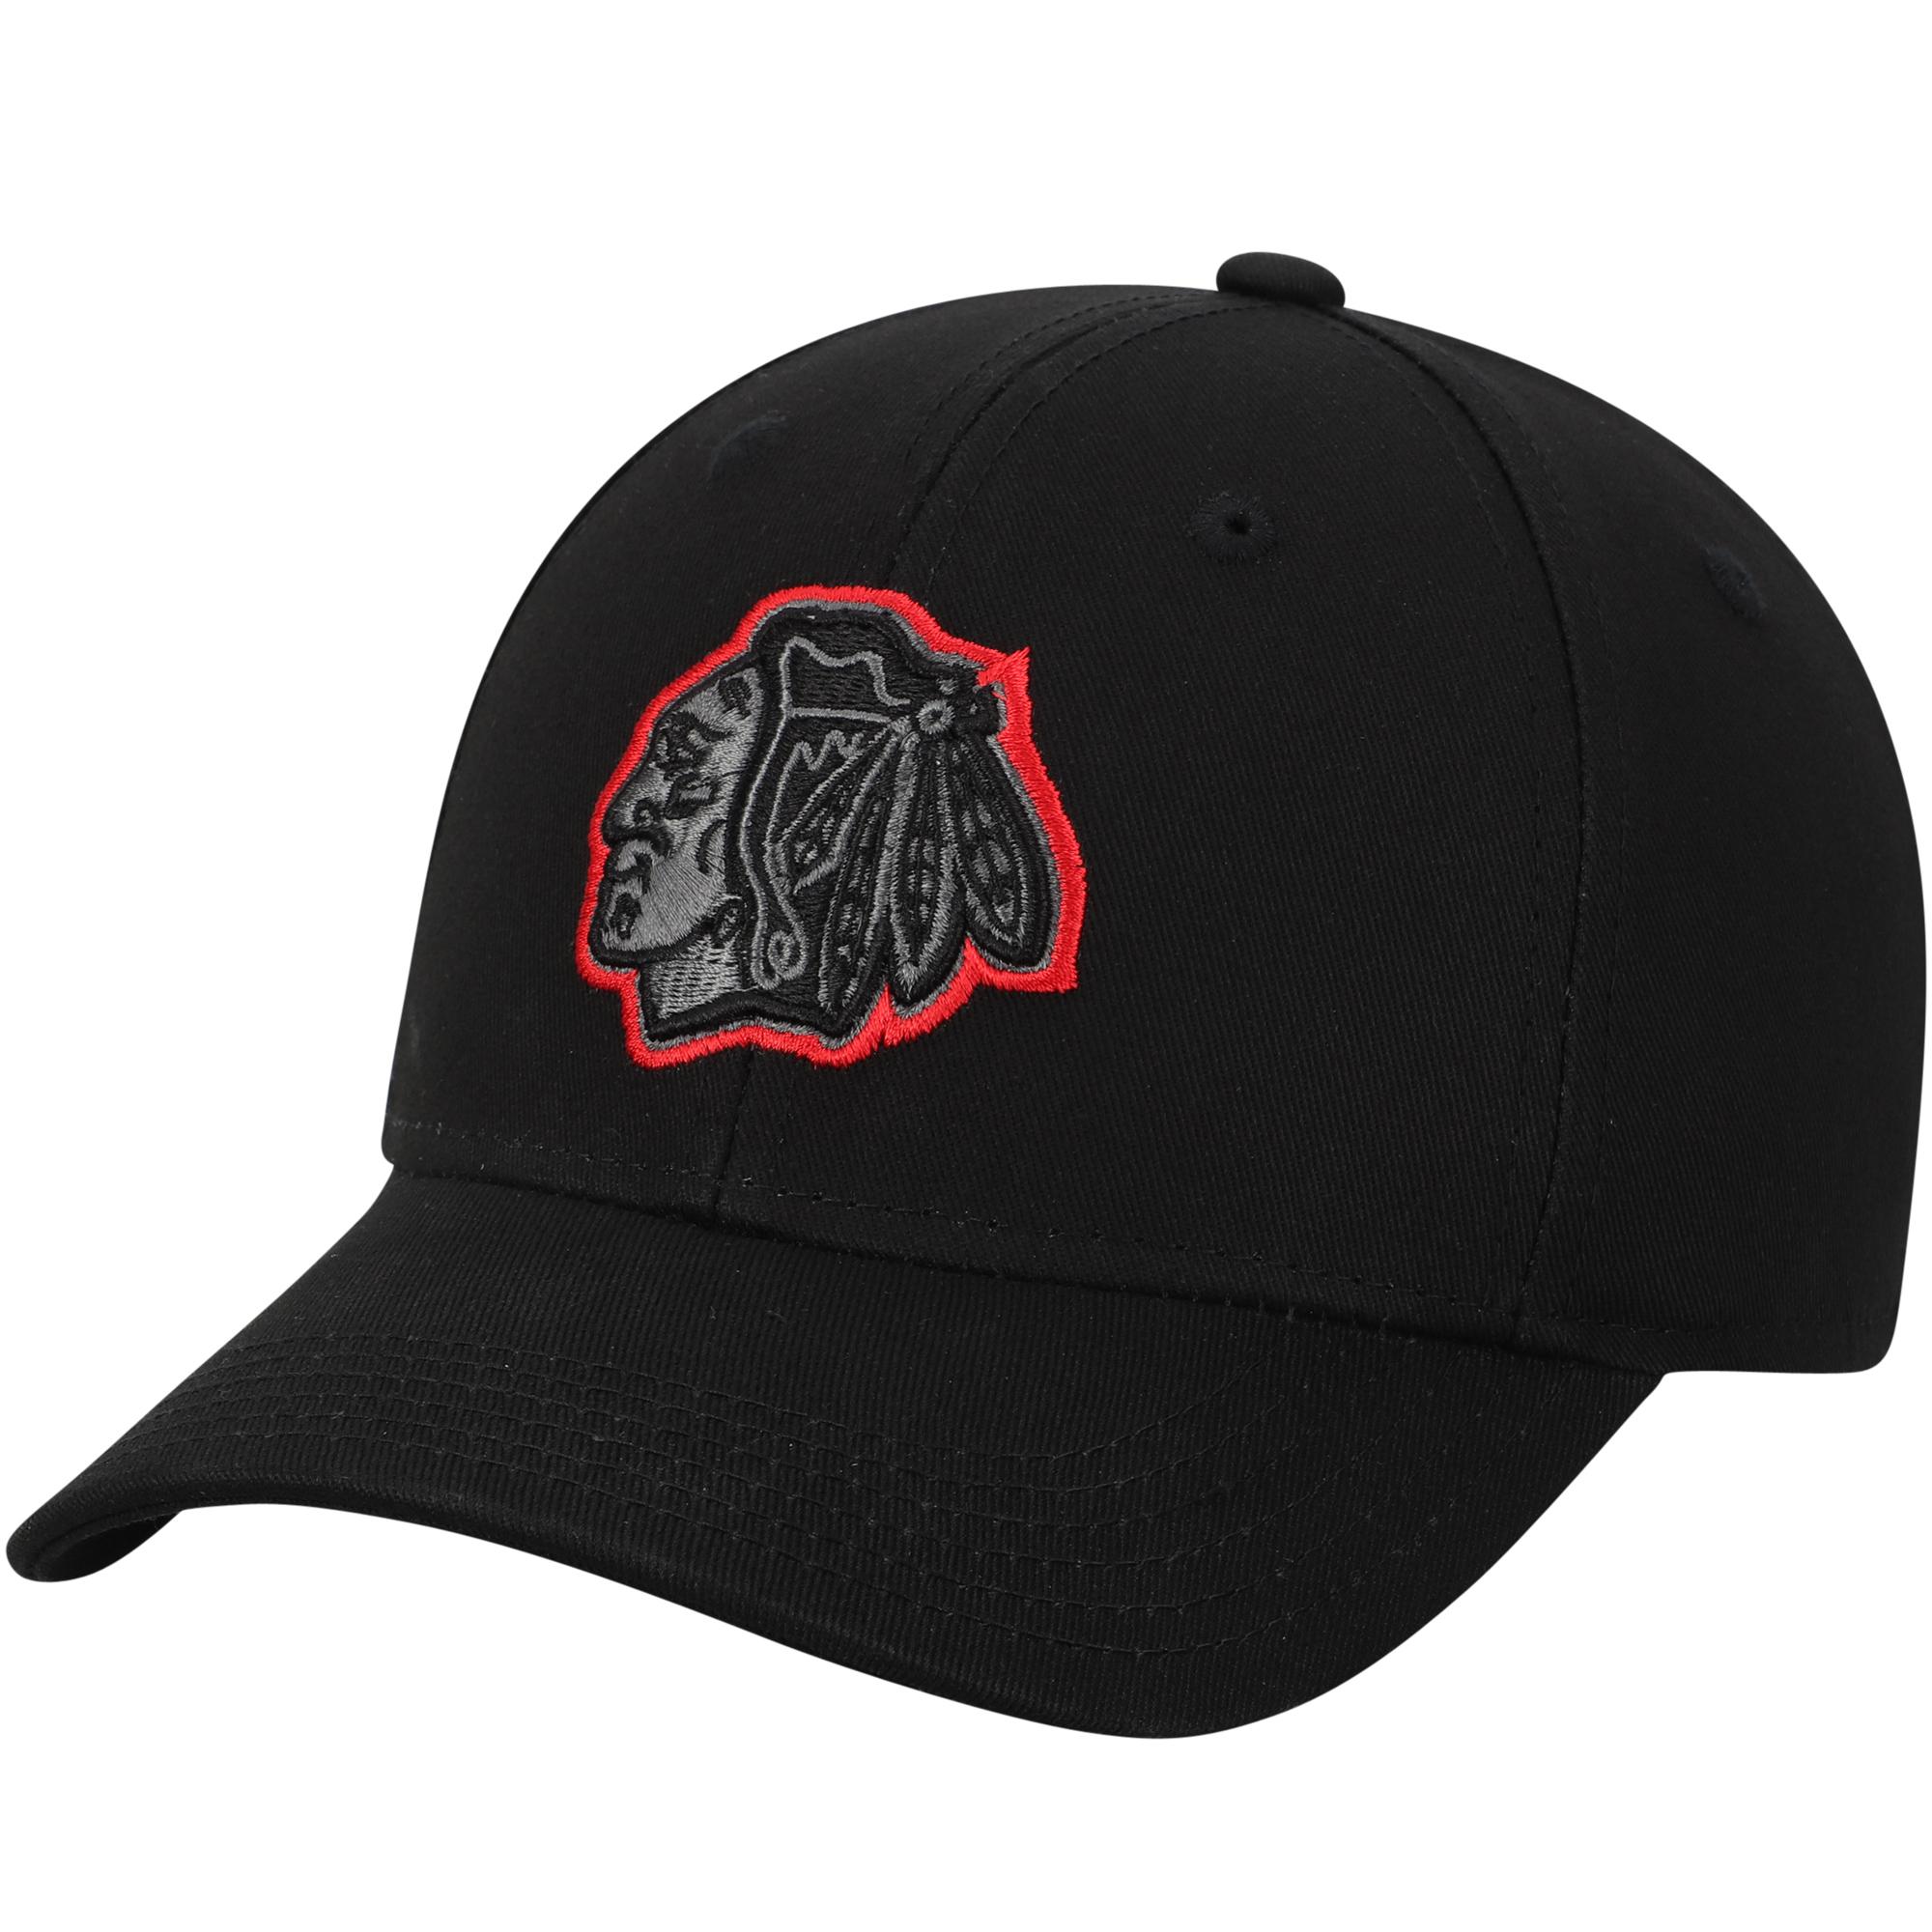 Chicago Blackhawks Youth Color Pop Structured Adjustable Hat - Black - OSFA